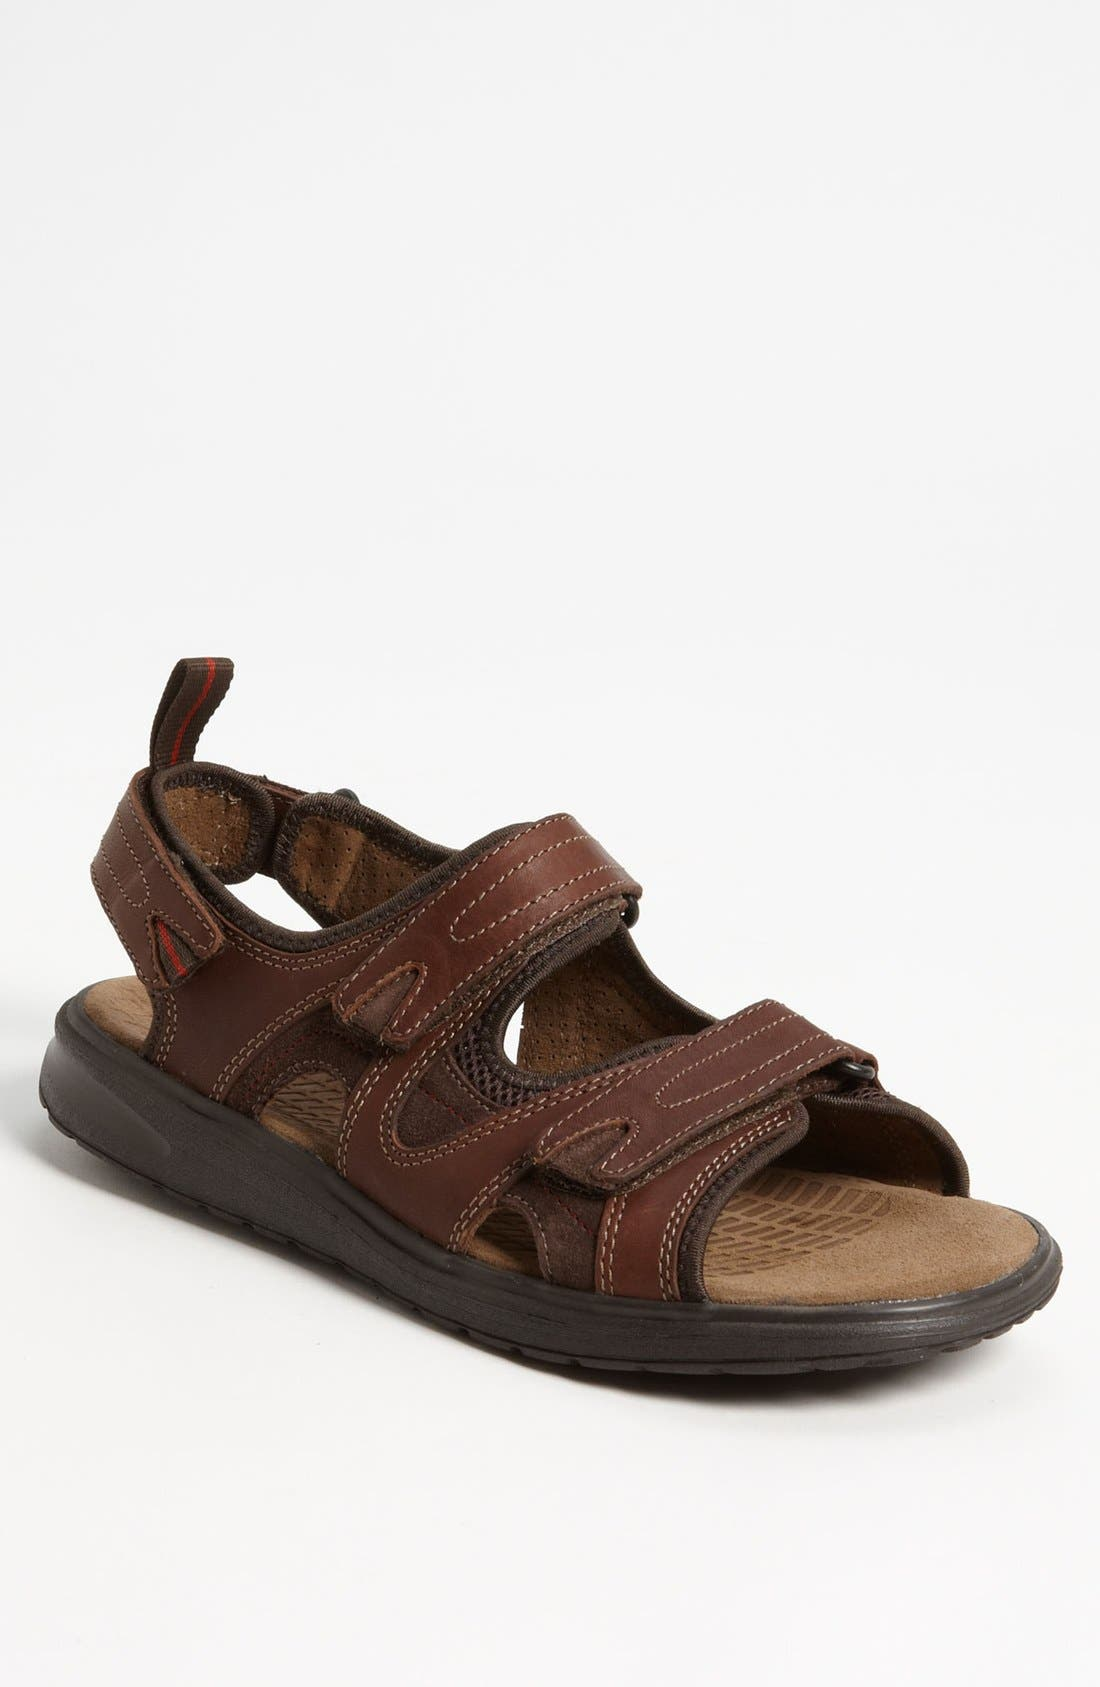 Alternate Image 1 Selected - Clarks® 'Unstructured - Caicos' Sandal   (Men)